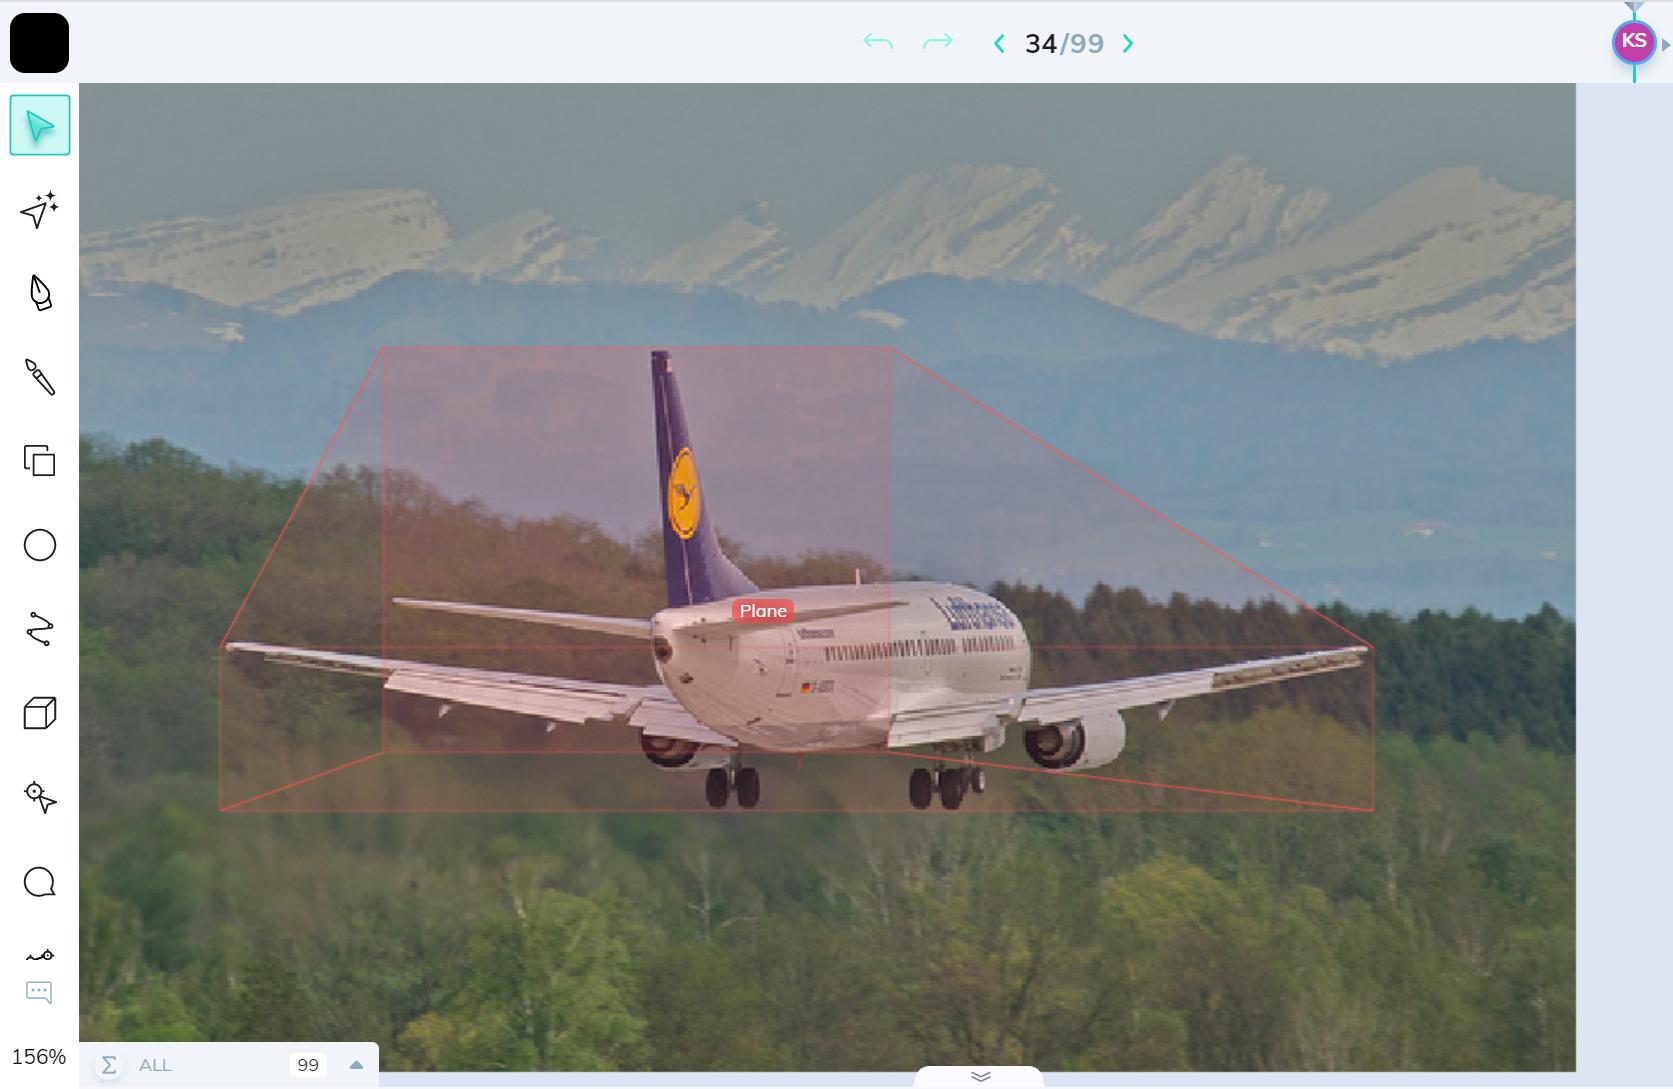 Plane annotation using 3D cuboid in V7